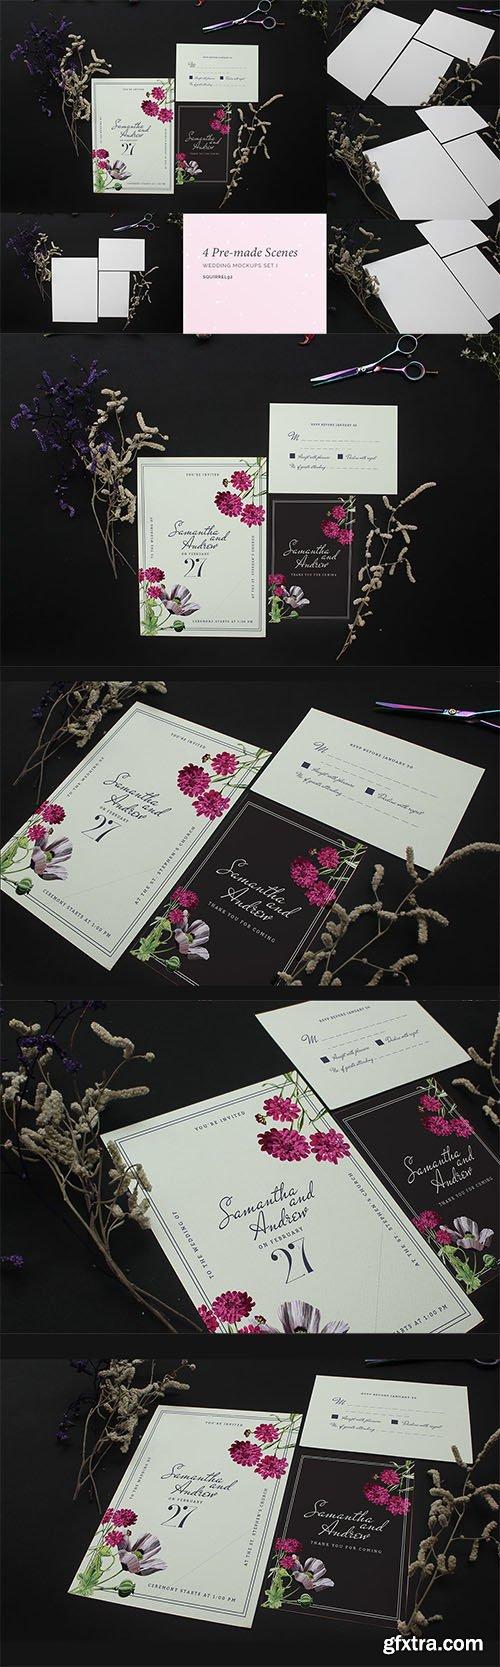 Wedding Invitation Mockup Set I